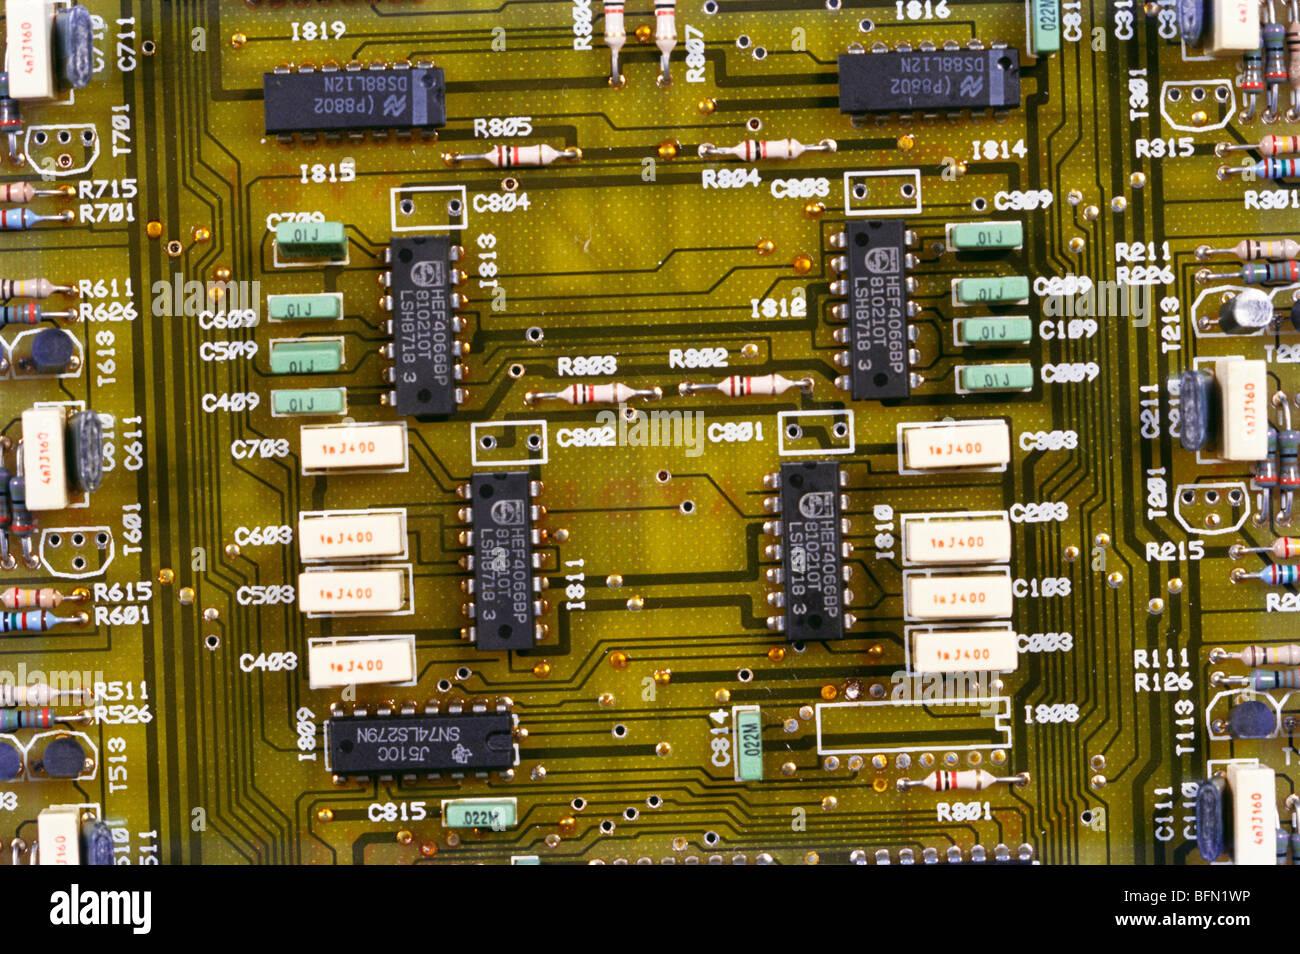 RJP 61272: PCB Elektronik Platine; Indien Stockbild